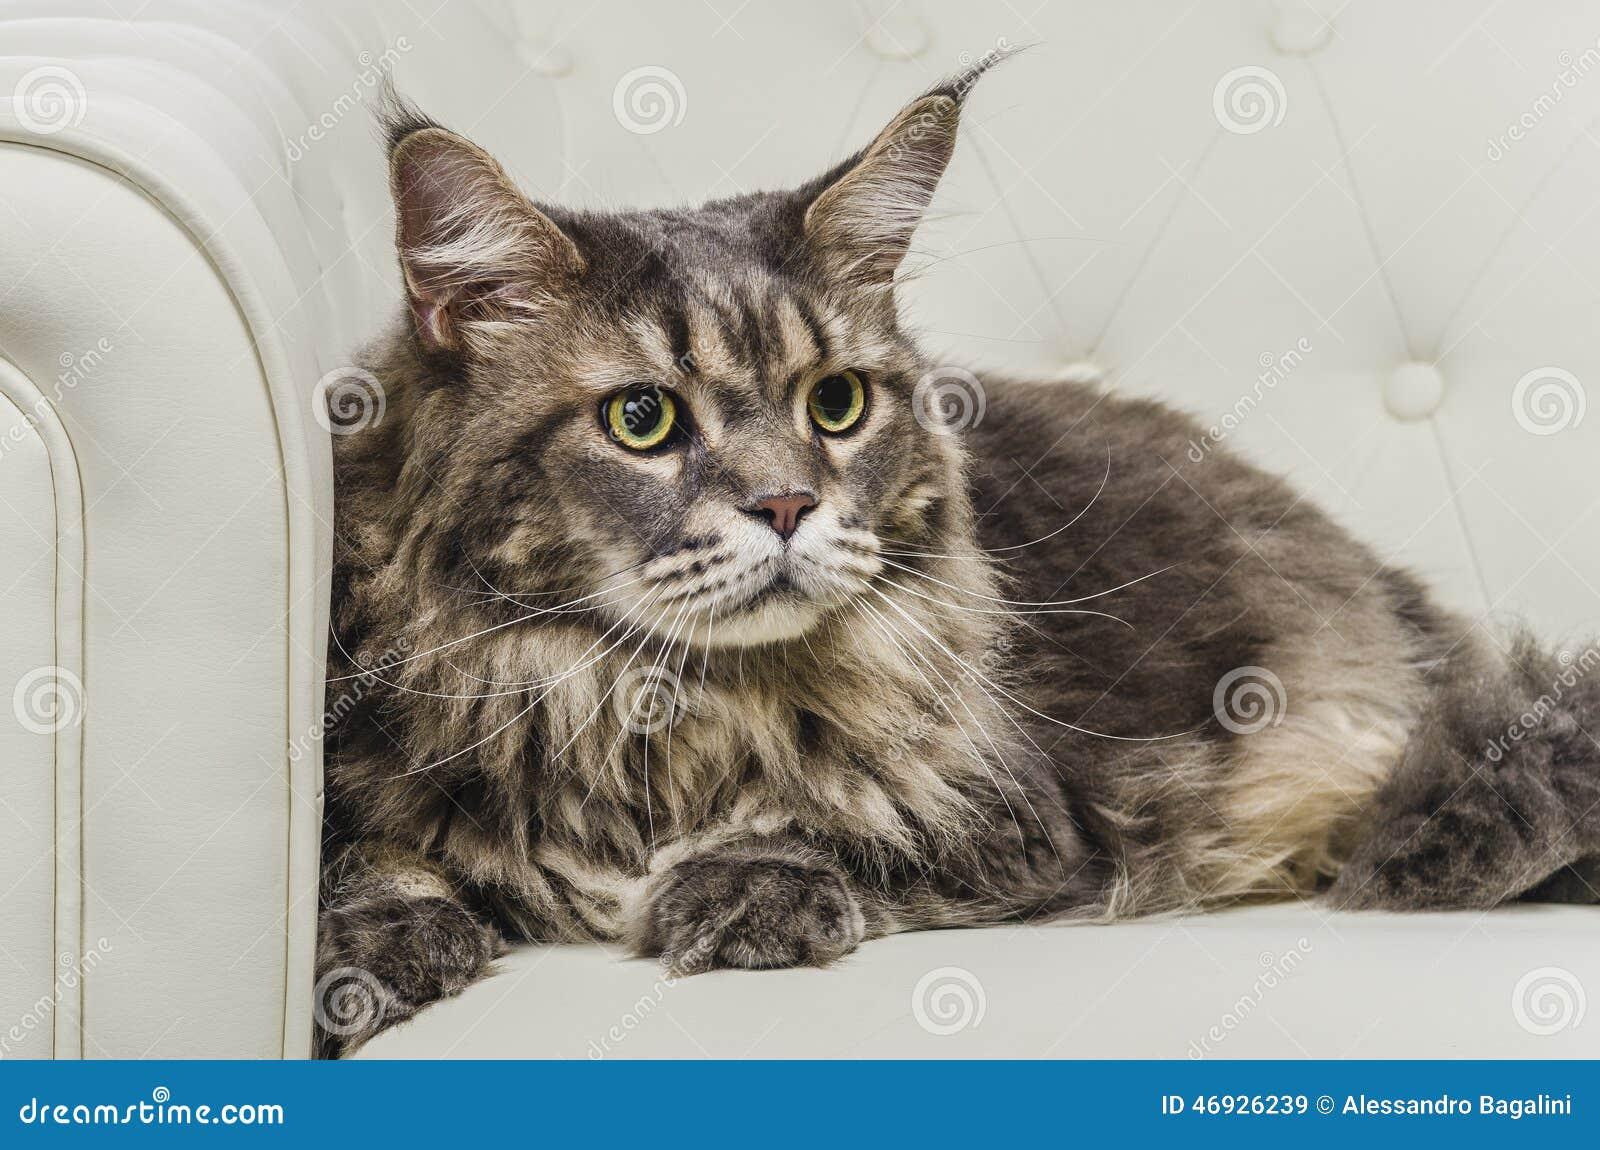 Mancunian Cat Pictures